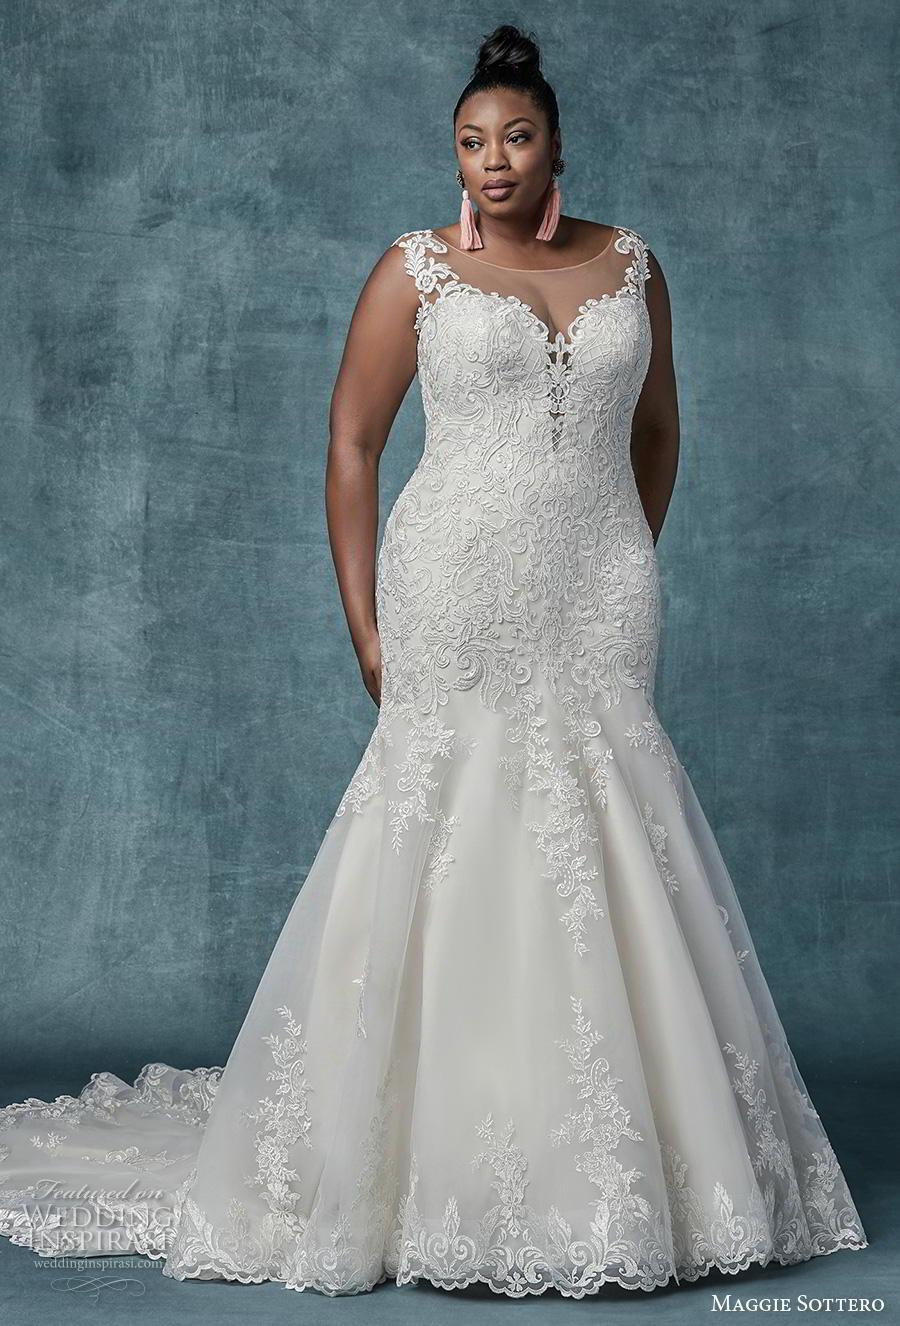 maggie sottero spring 2019 bridal sleeveless illusion bateau sweetheart neckline heavily embellished bodice elegant mermaid wedding dress sheer lace back chapel train (13) mv